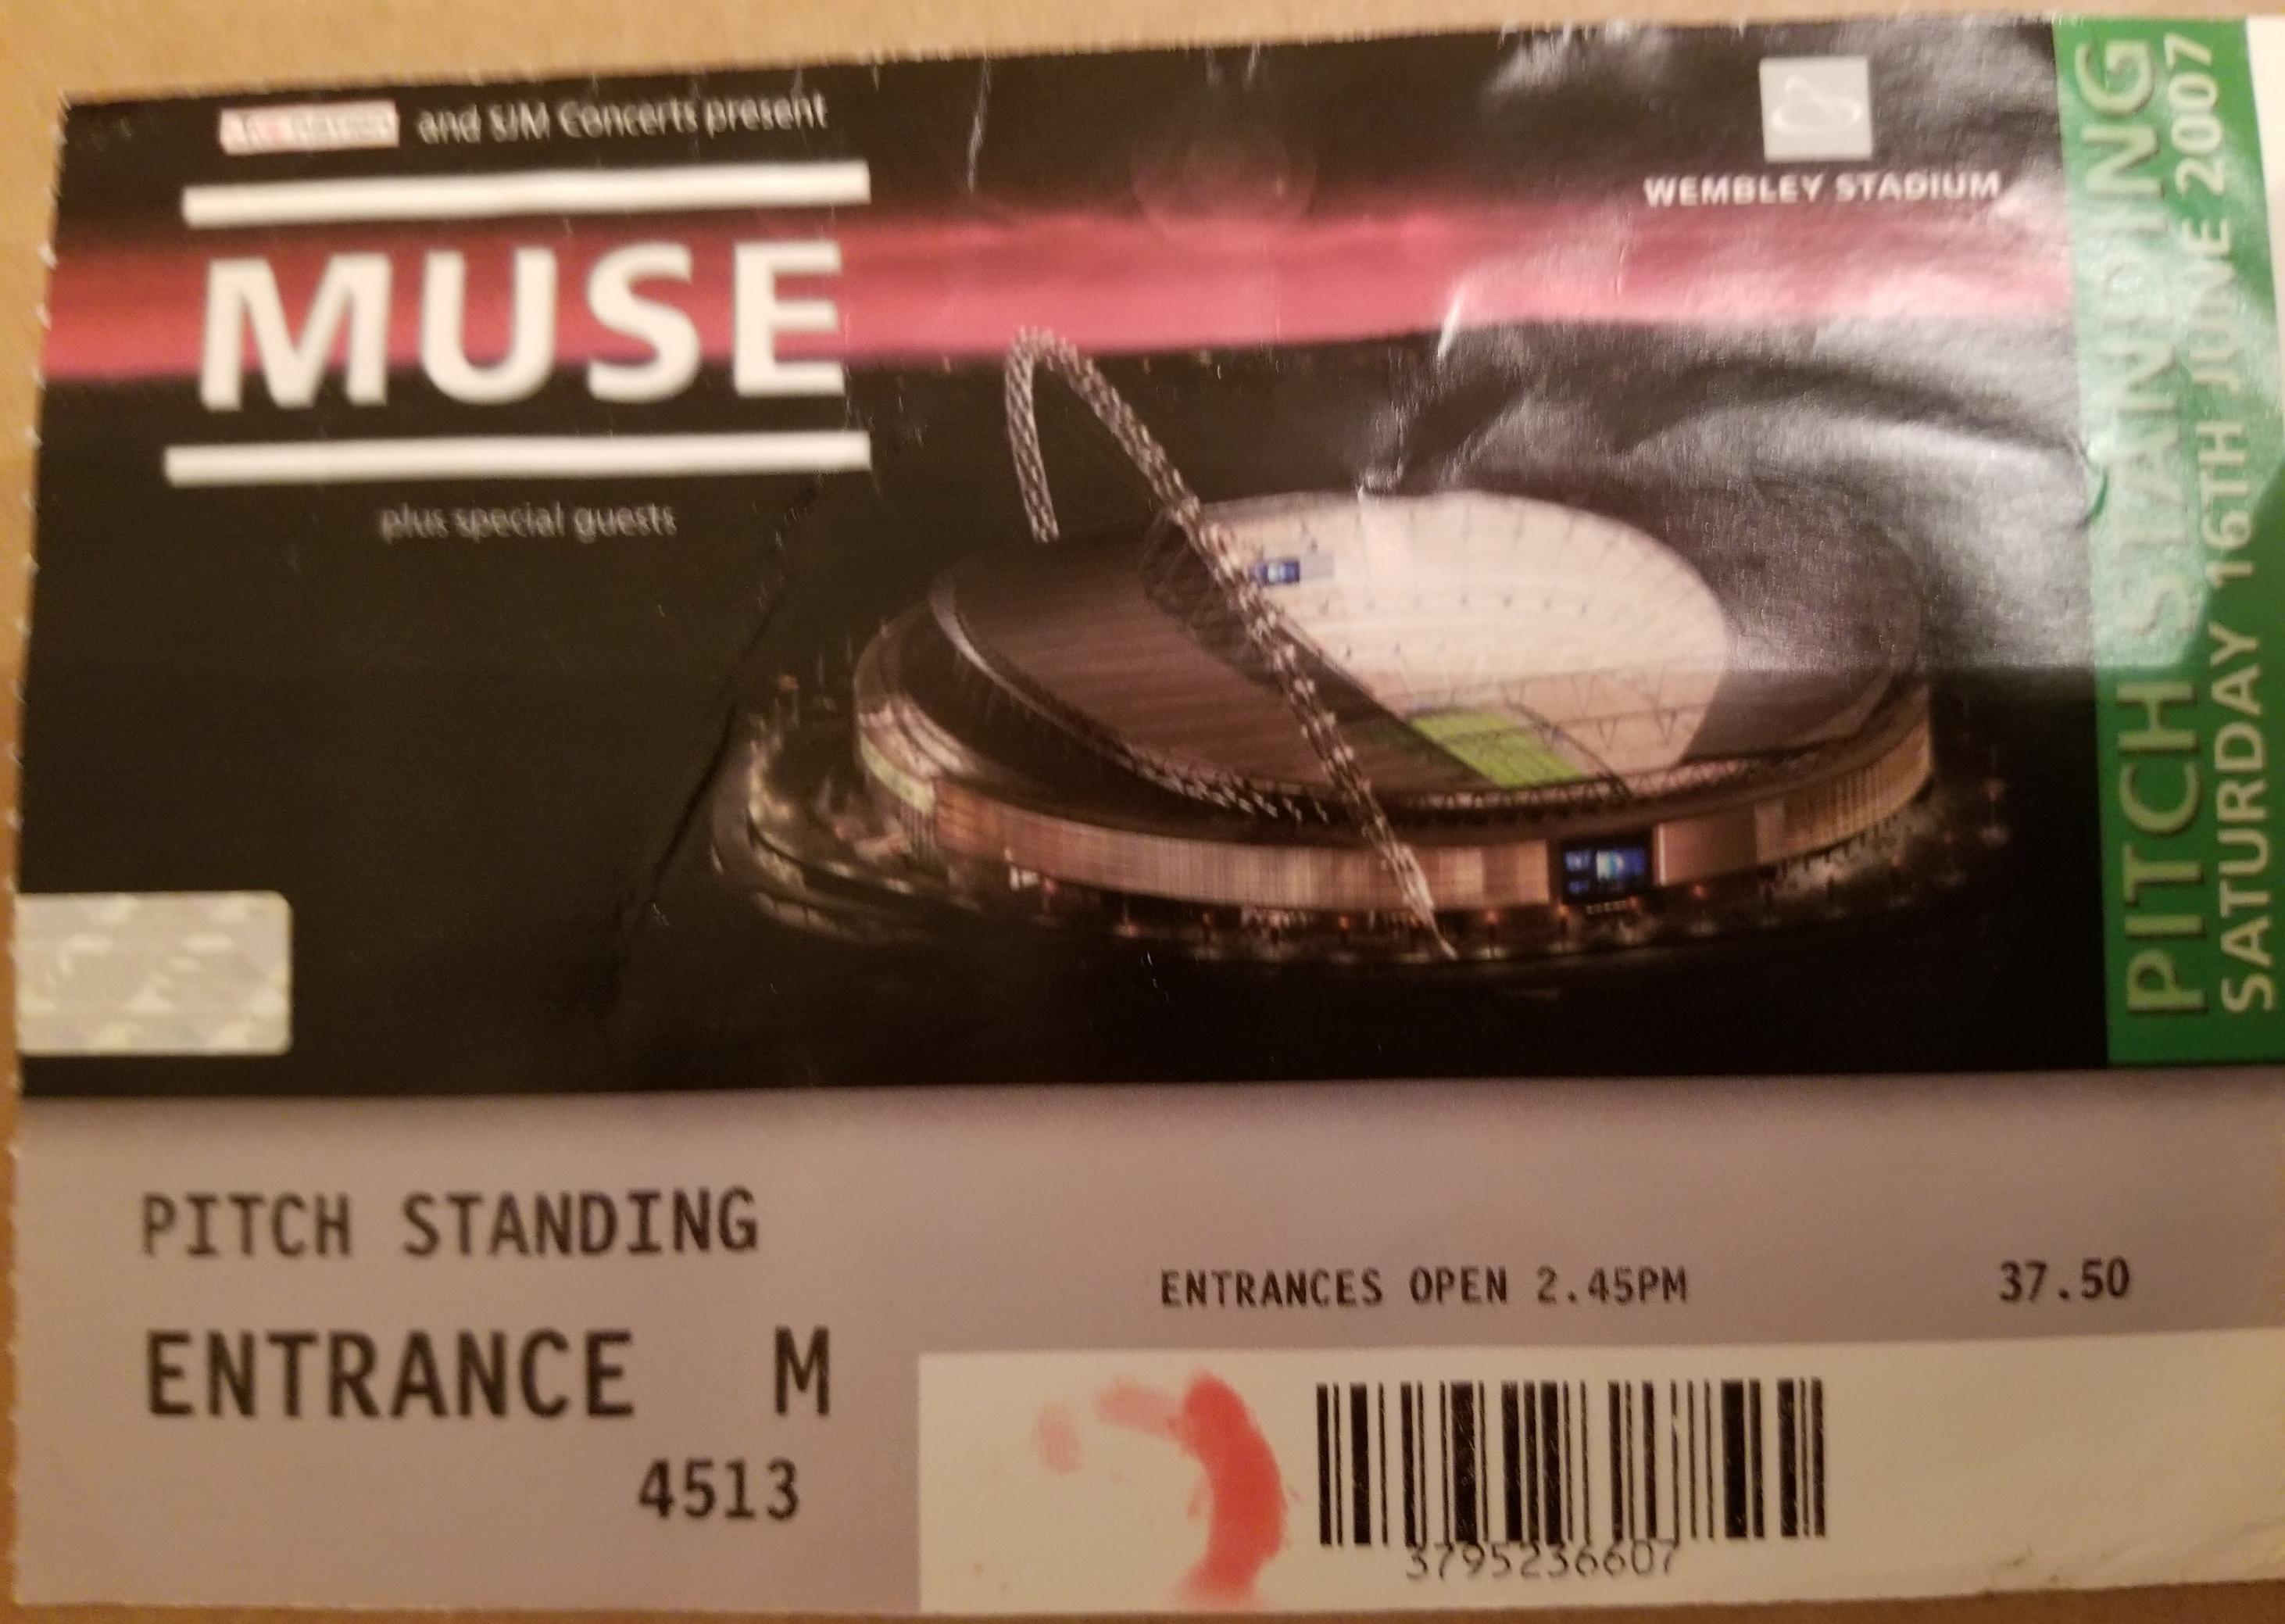 Muse (Wembley Stadium, London, 16/06/07) – NICK POLLARD